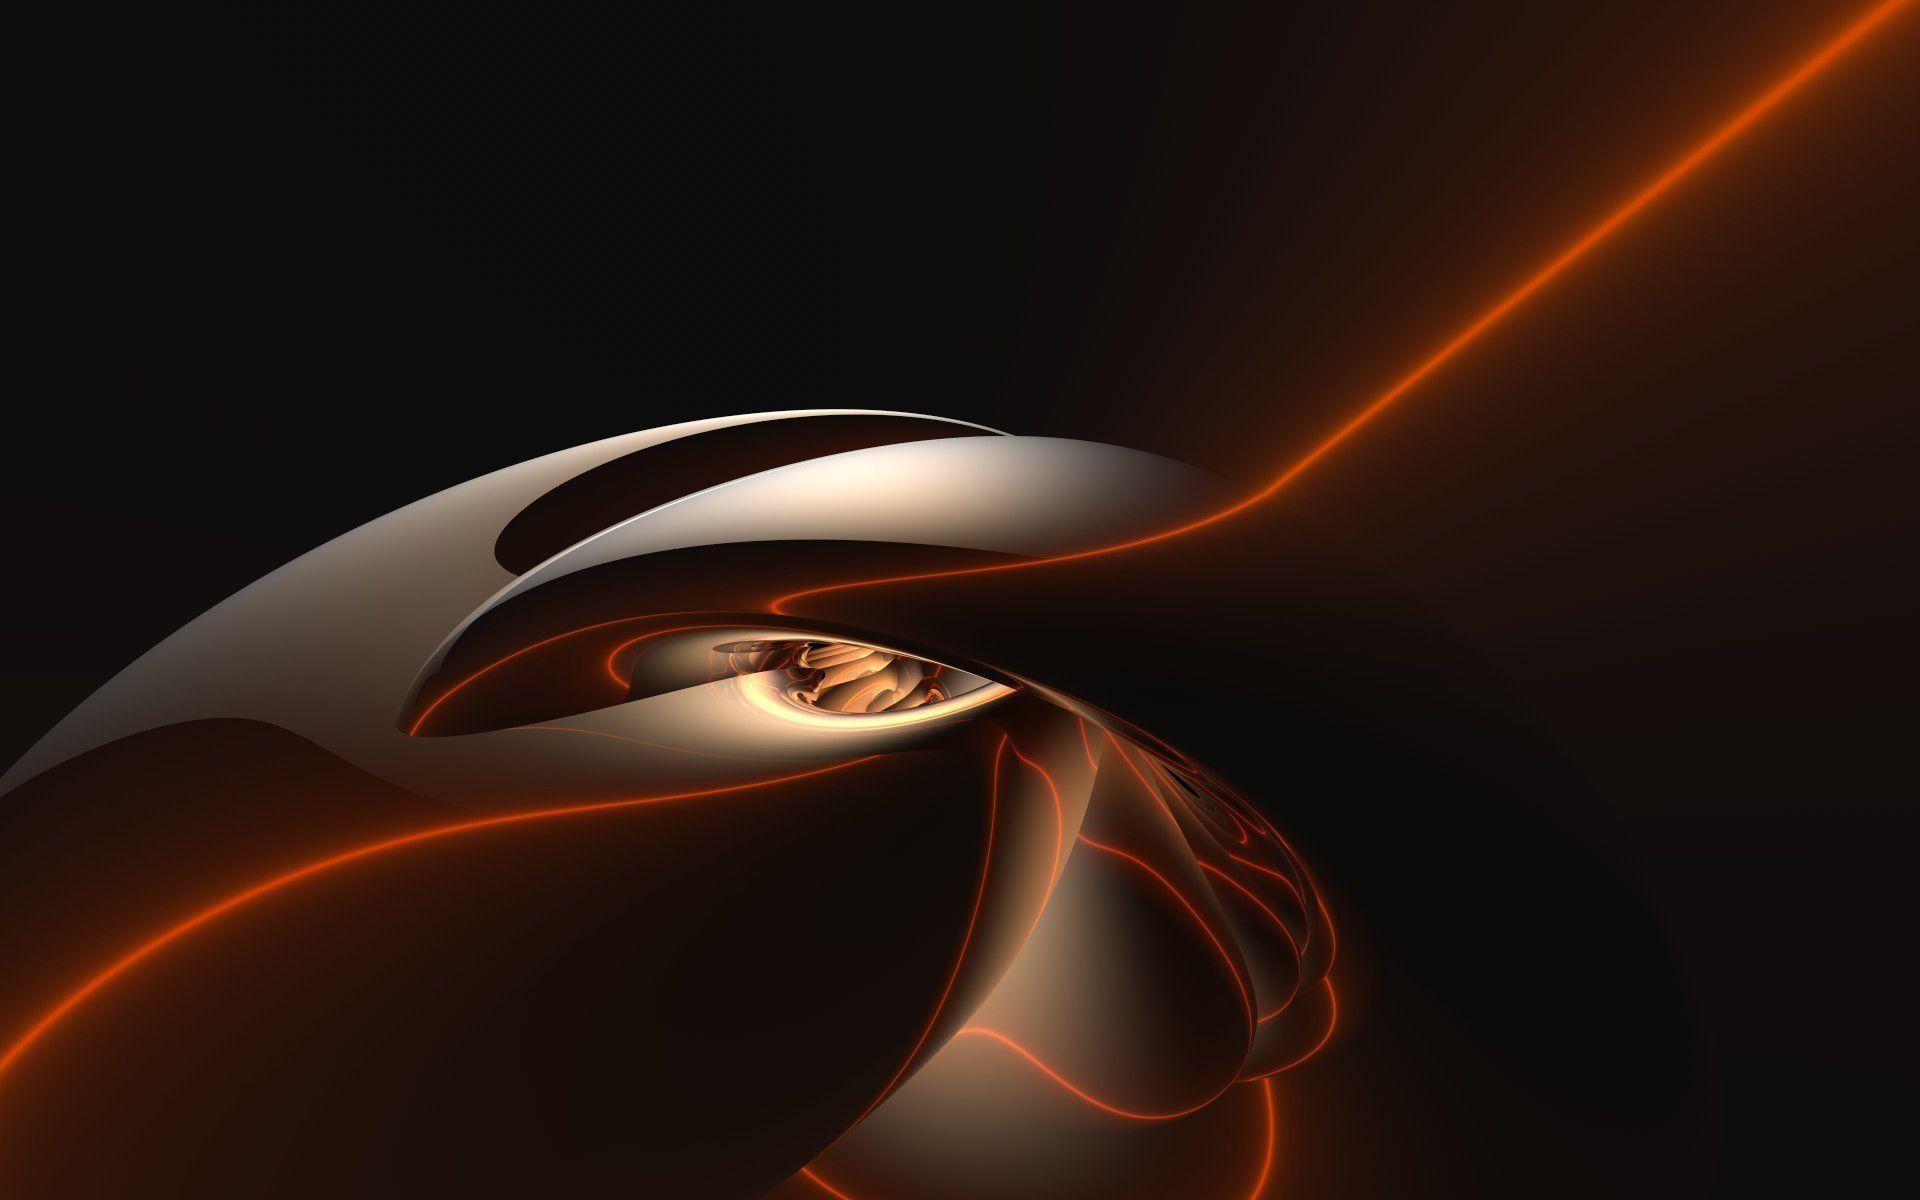 Black And Orange Wallpaper Hd: Abstract Orange Black - Google Search